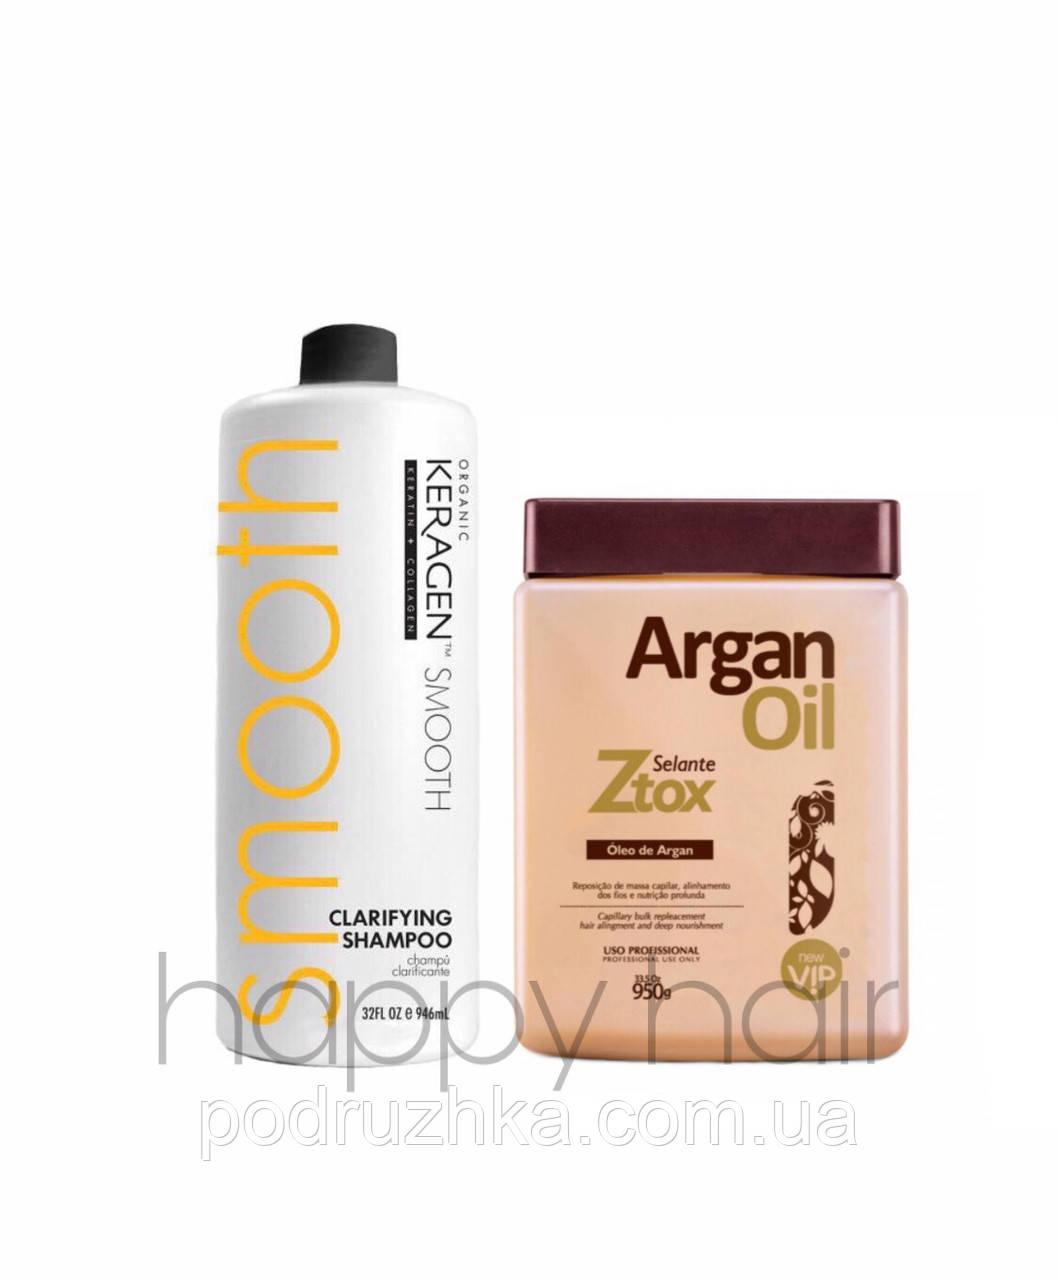 Btox Selante Ztox Oleo de Argan Набор ботекс для волос 200/500 г